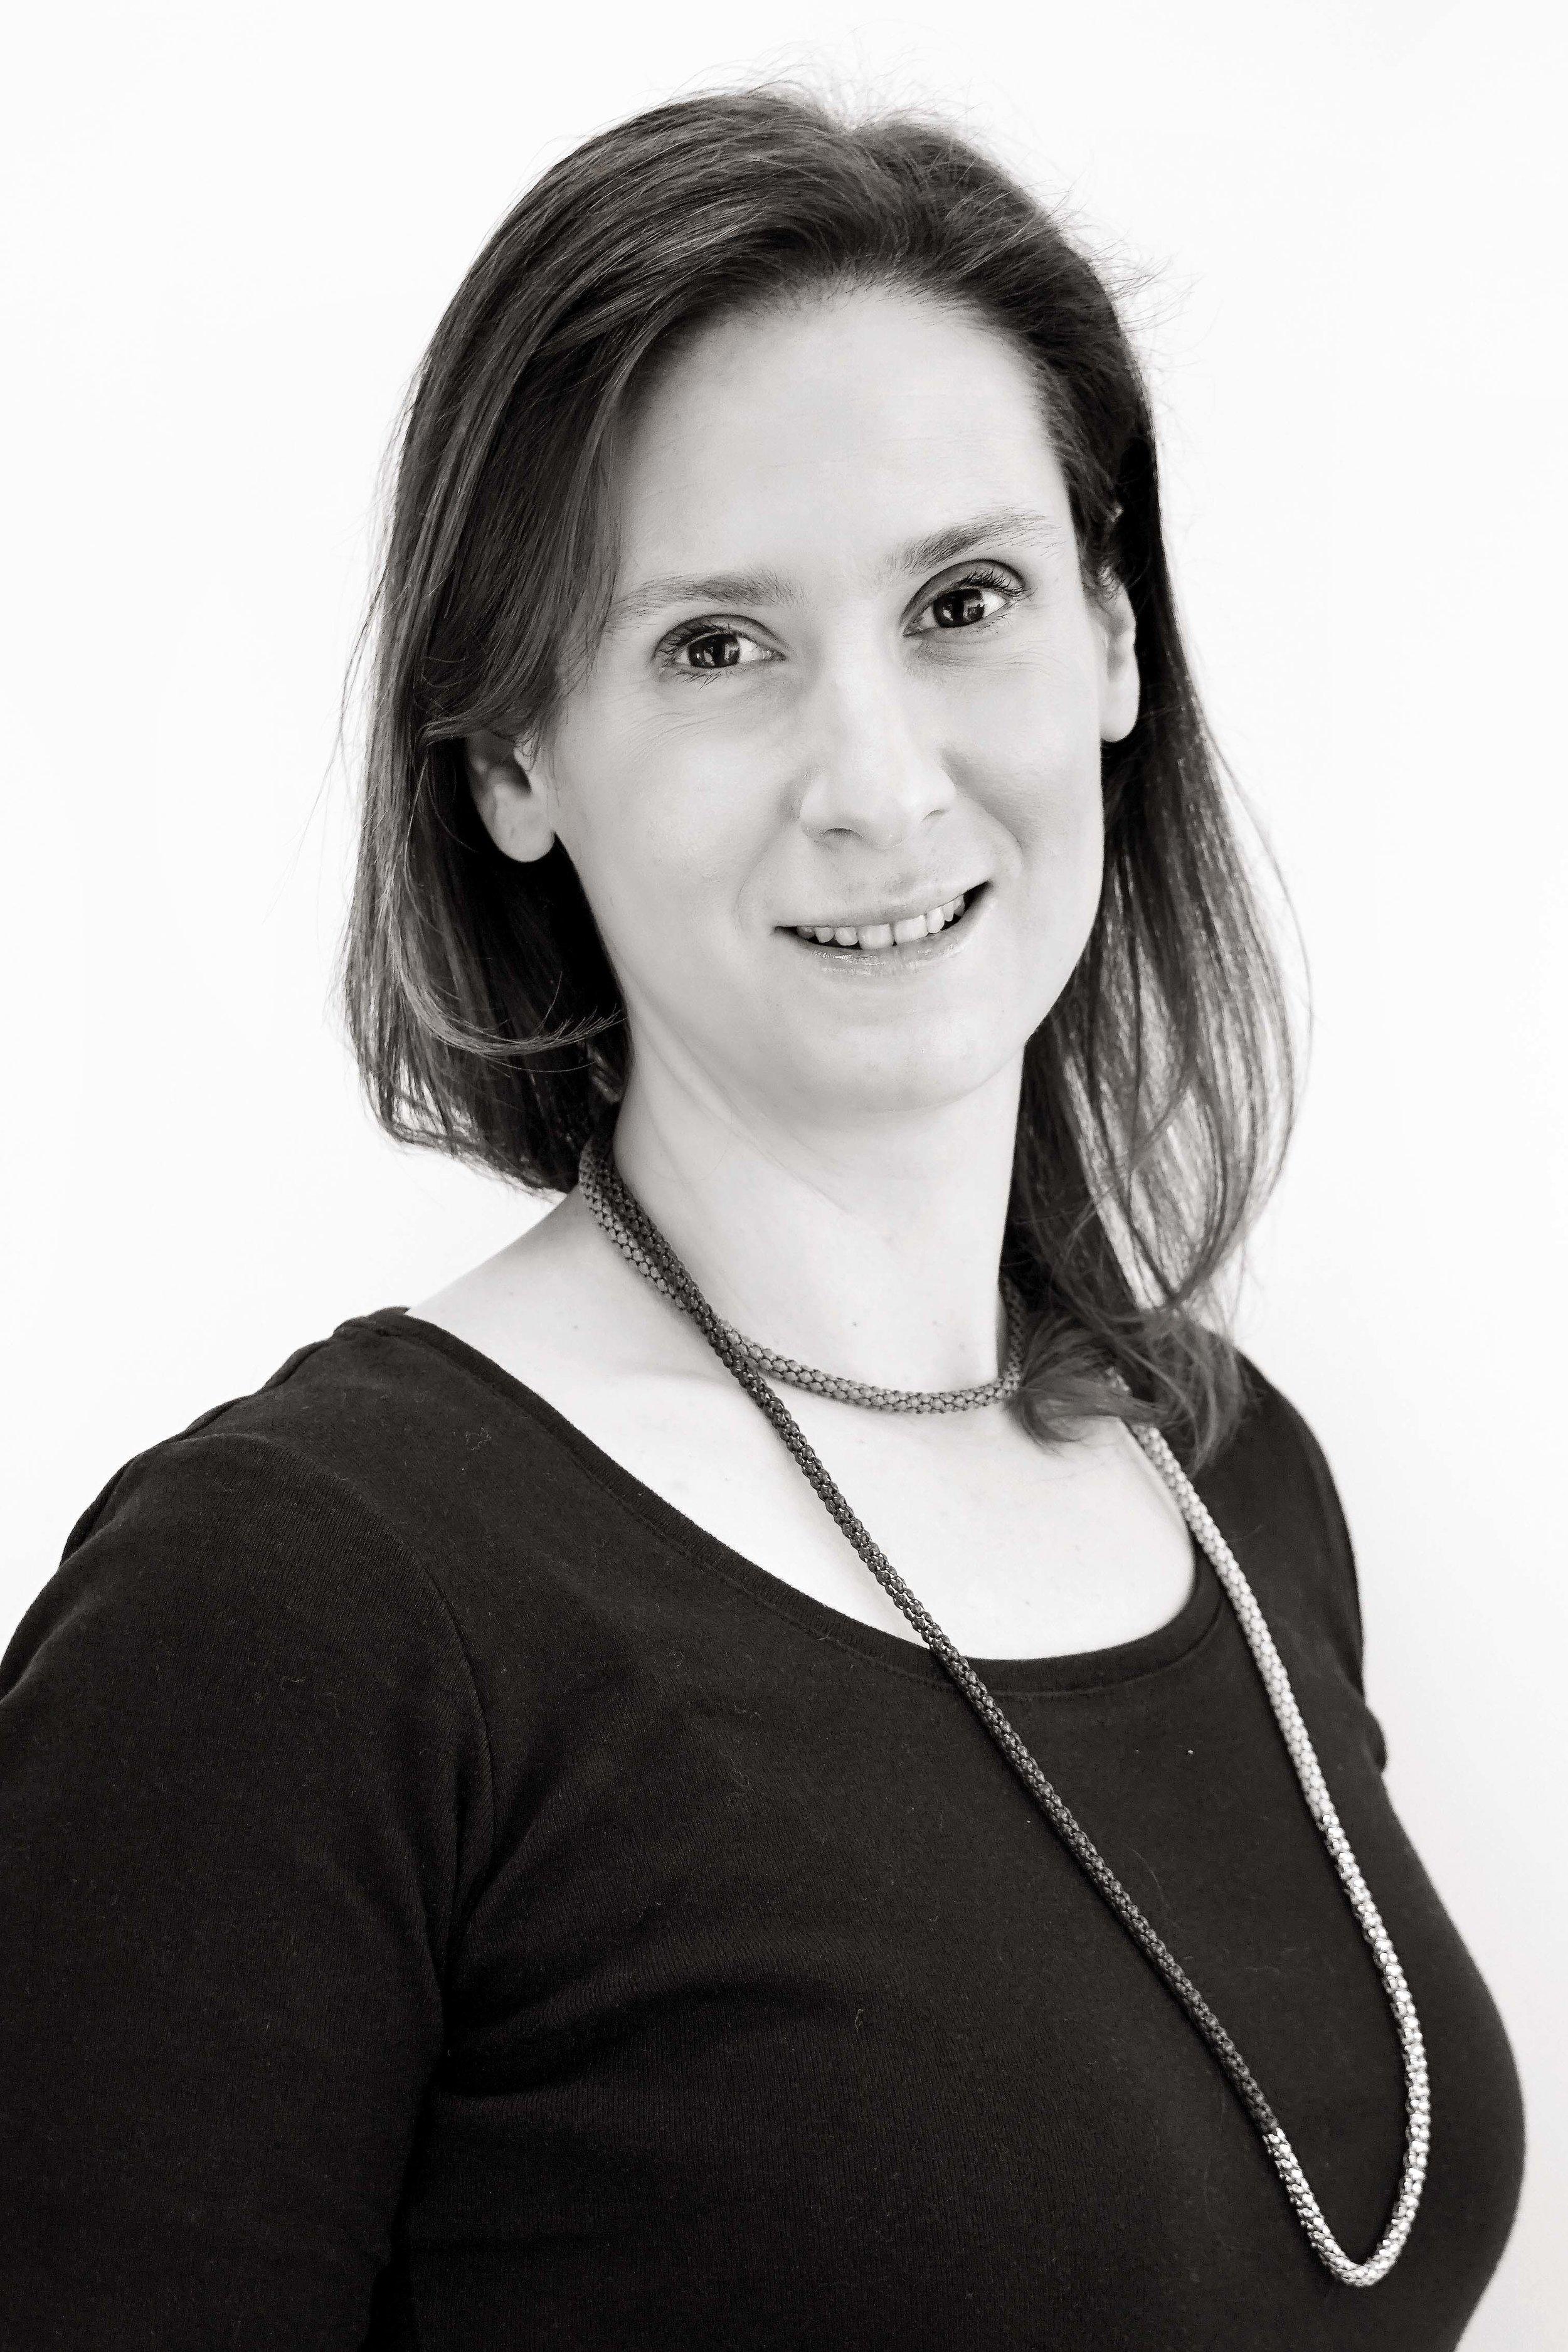 Simona Mayer